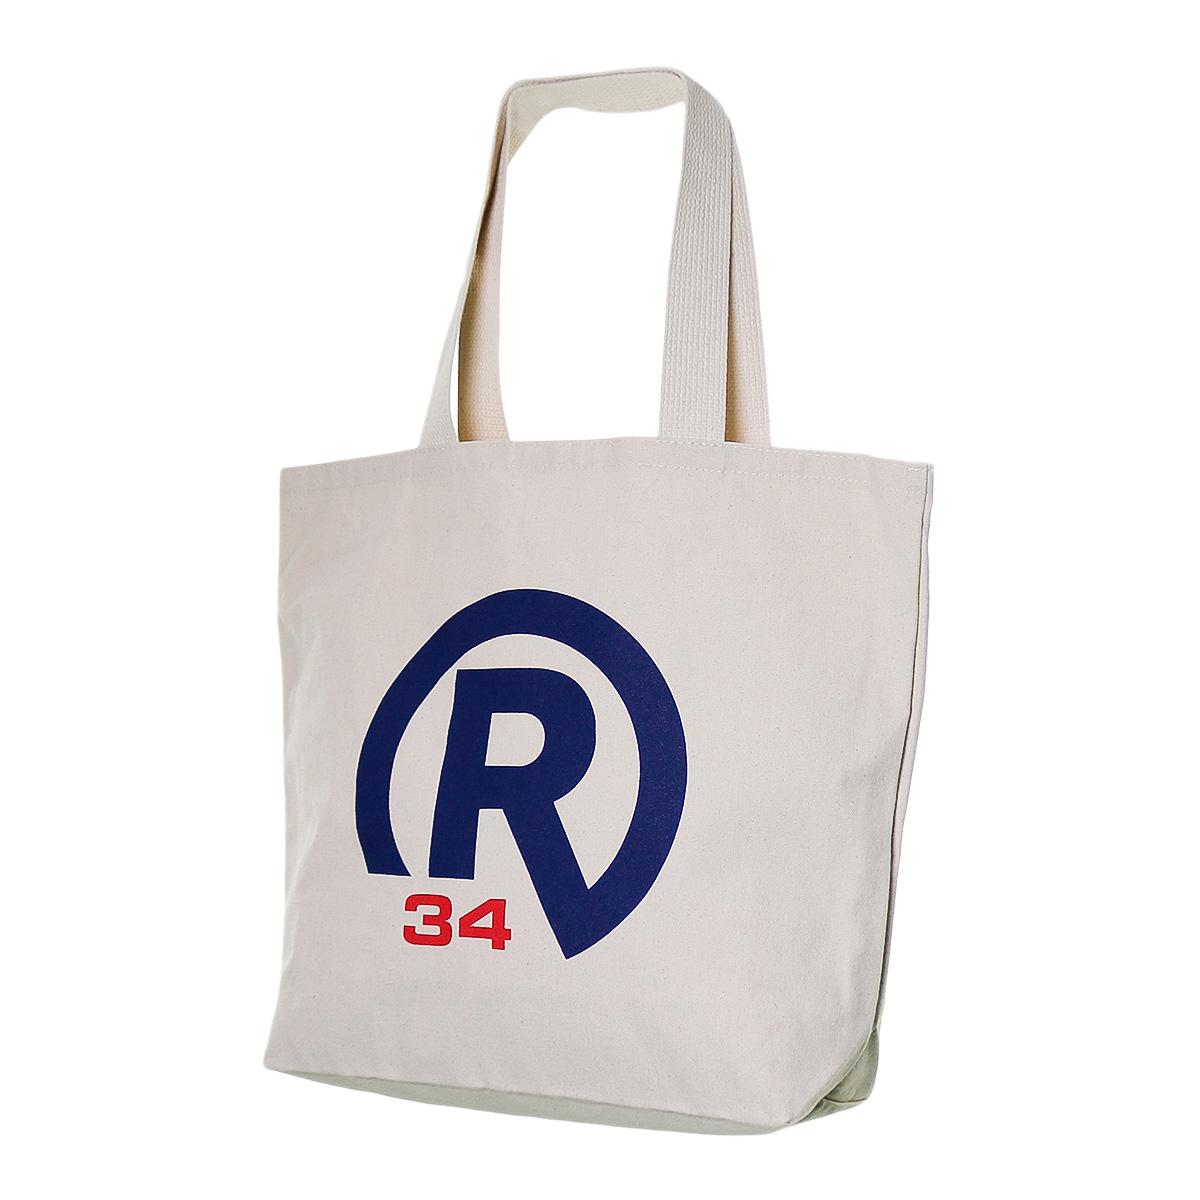 R34 USA CANVAS TOTE BAG